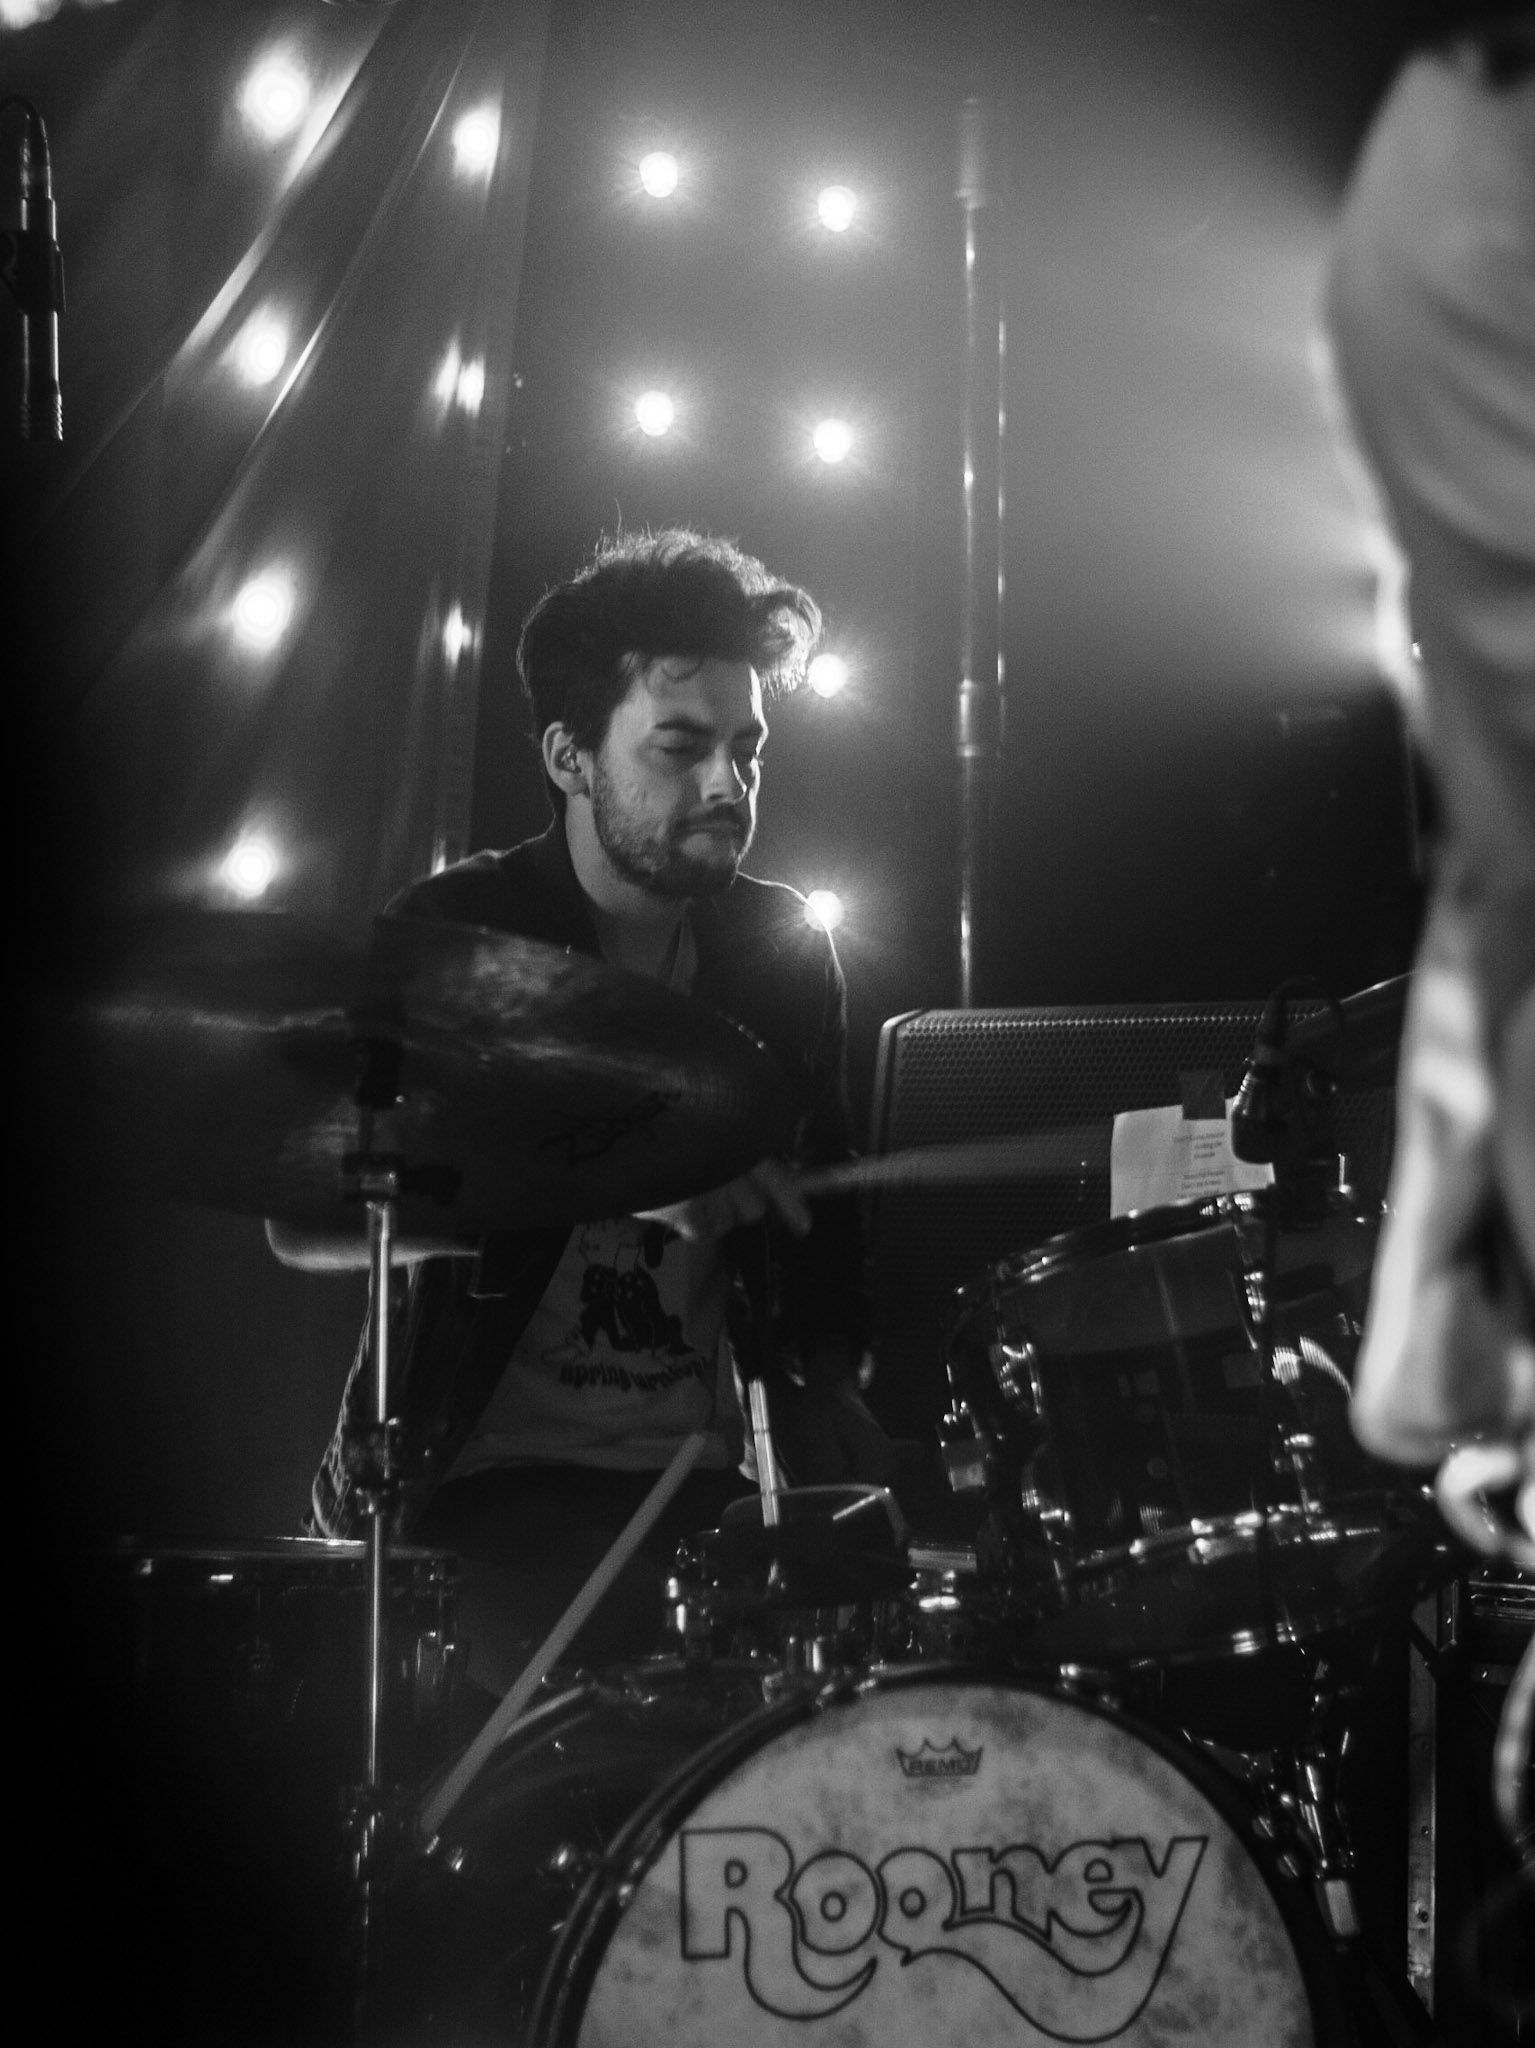 Rooney at Rock and Roll Hotel (Photo by Carolina Correa Caro /  @veronik_bandw )